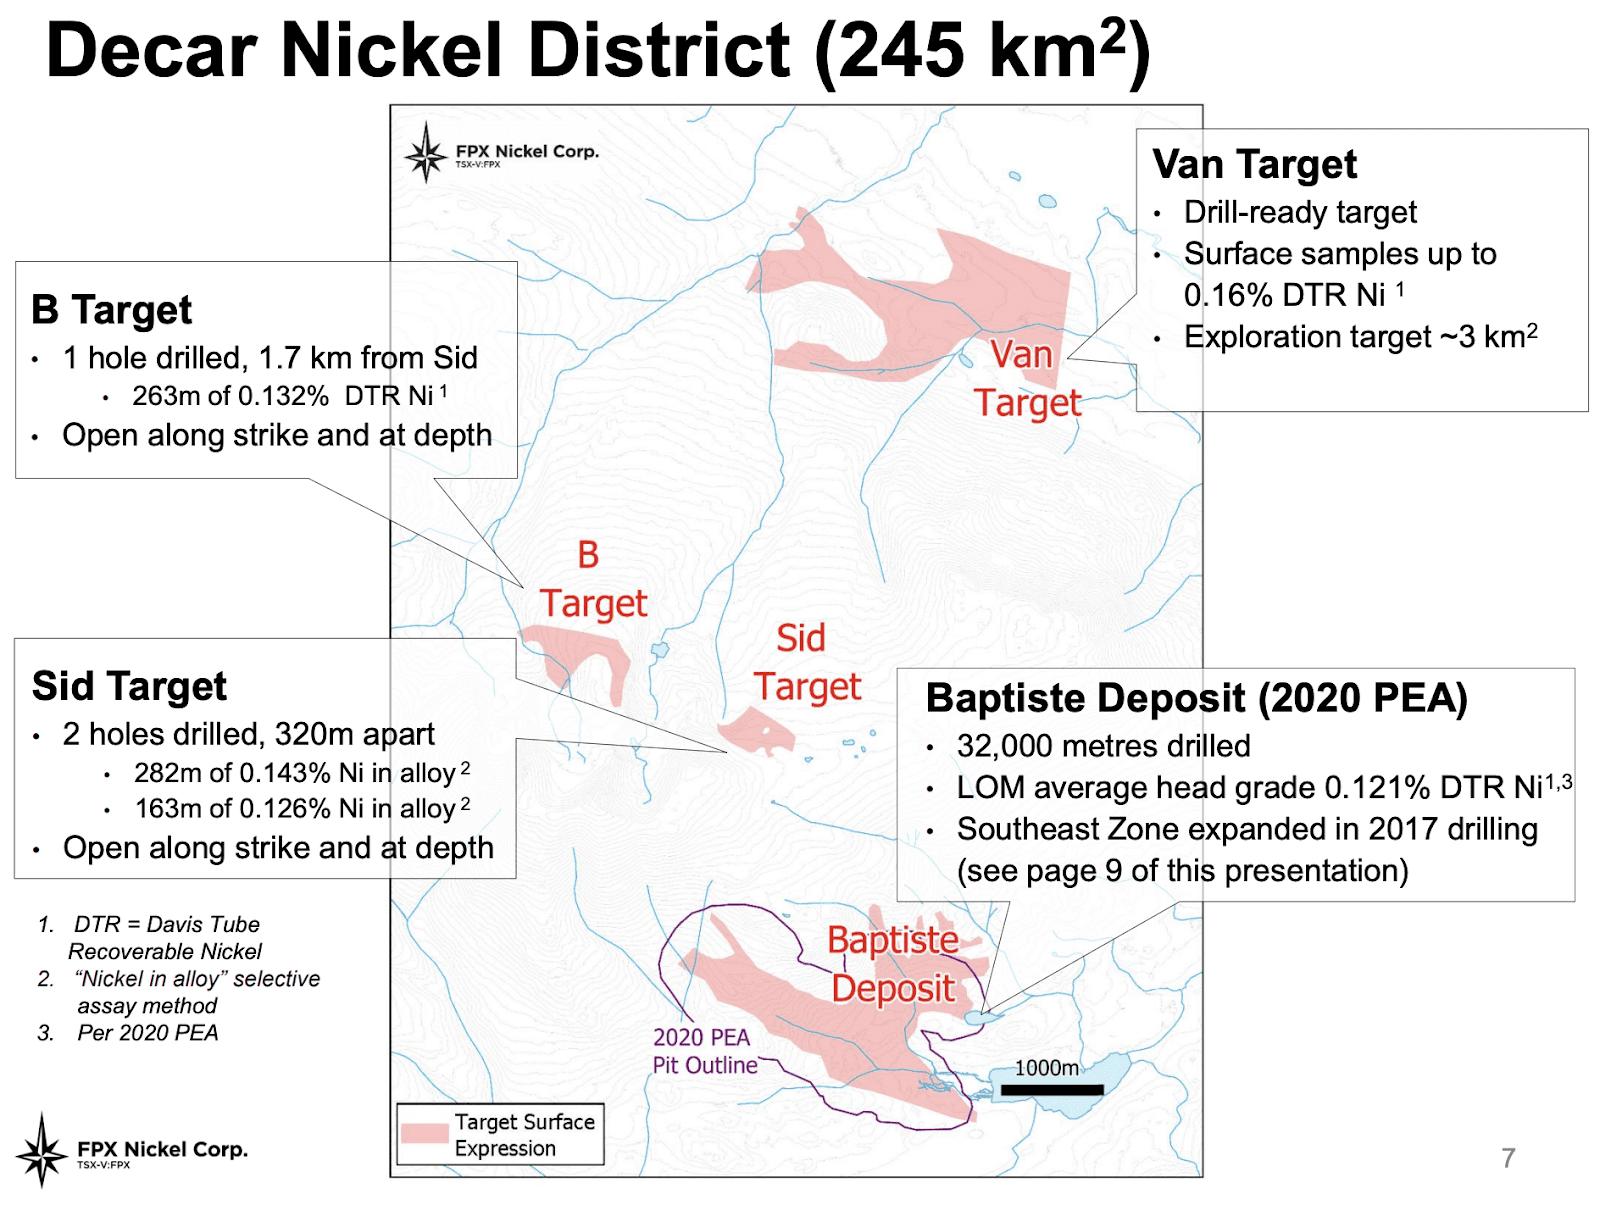 FPX Nickel Decar Nickel District